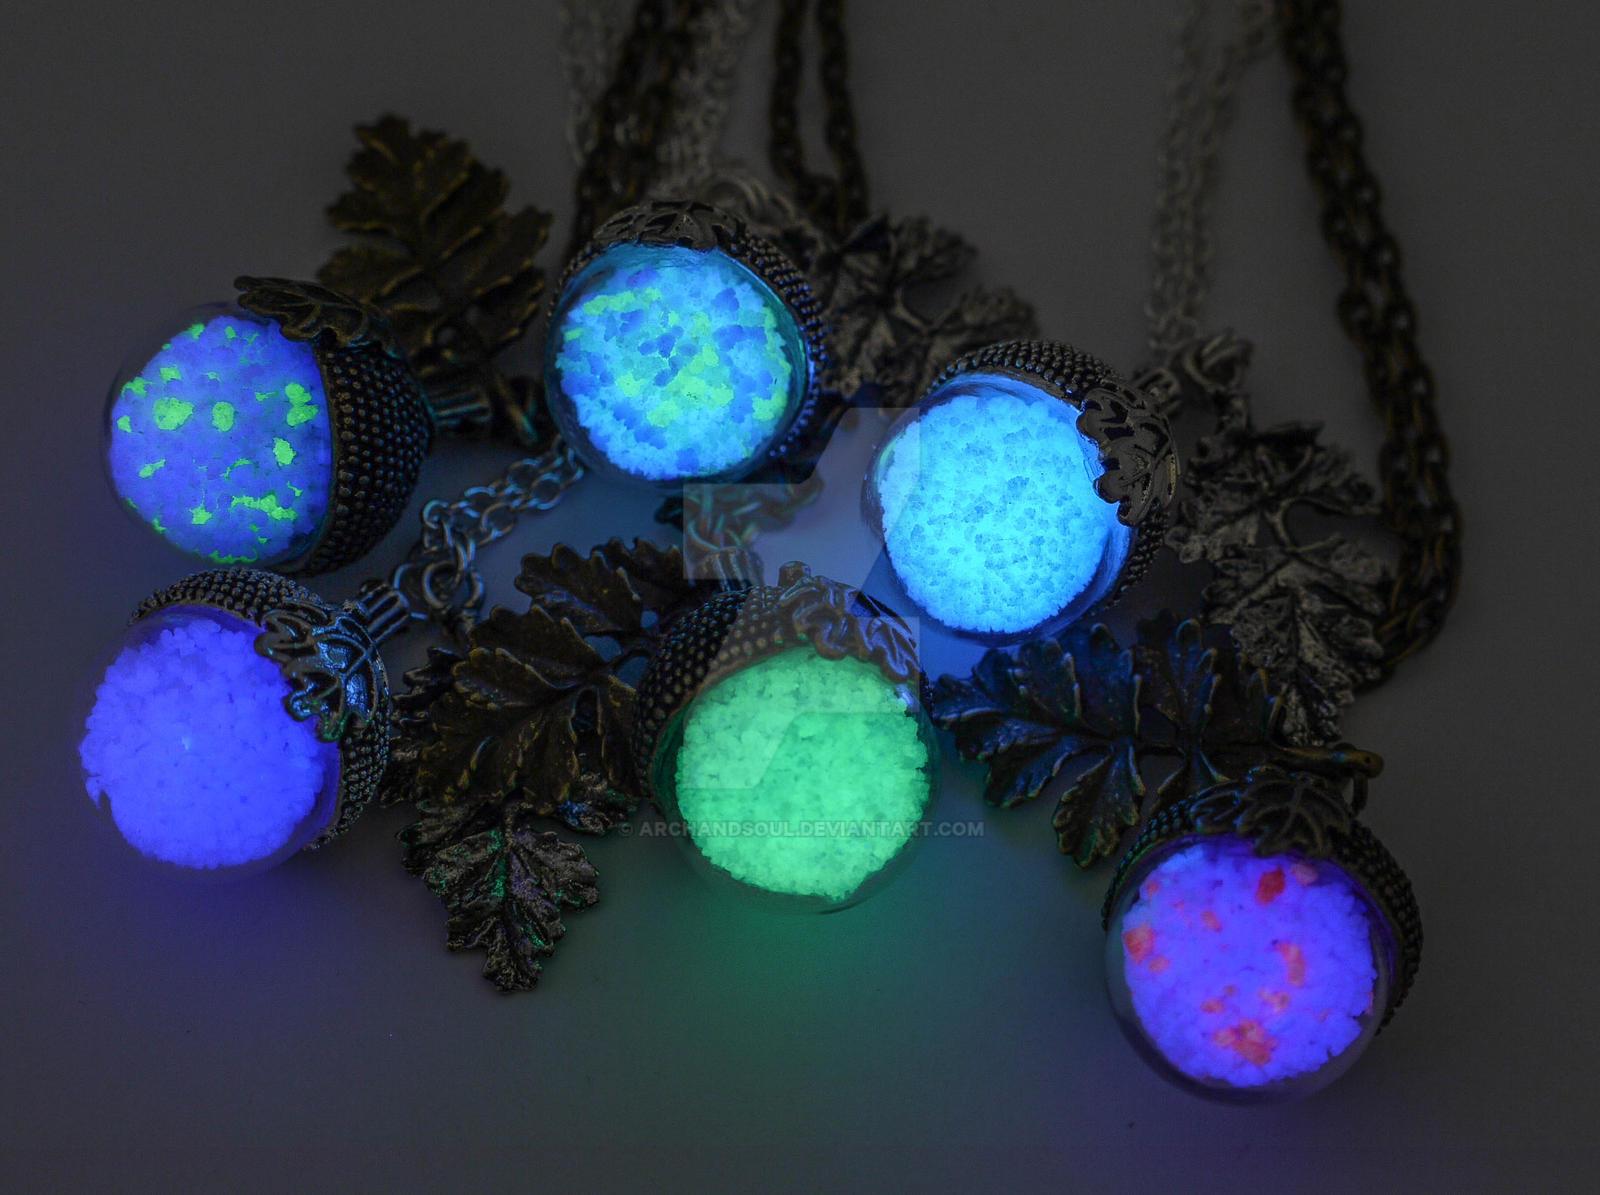 Elvish glowing acorn necklaces by archandsoul on deviantart for Acorn necklace craft